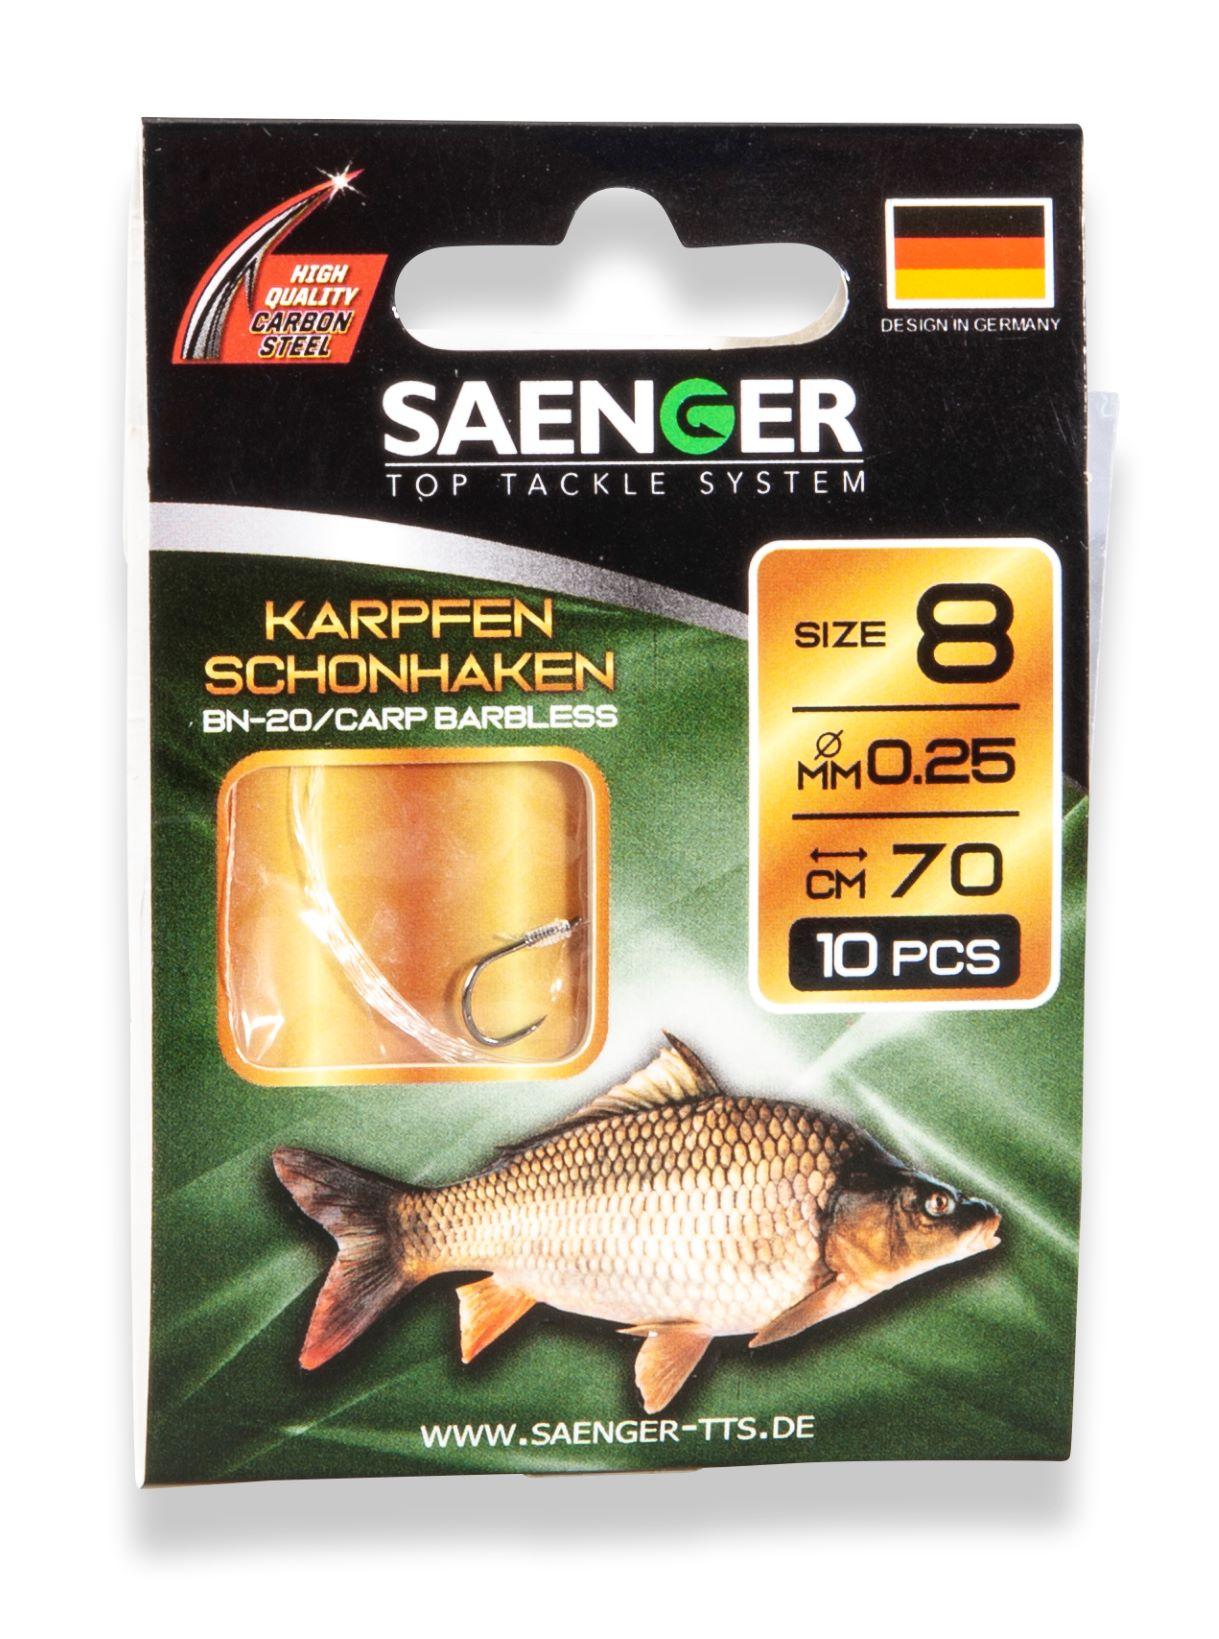 Saenger Návazec na kapry bezprotihrotý Karpfen Schonhaken vel. 2, 10 ks/bal